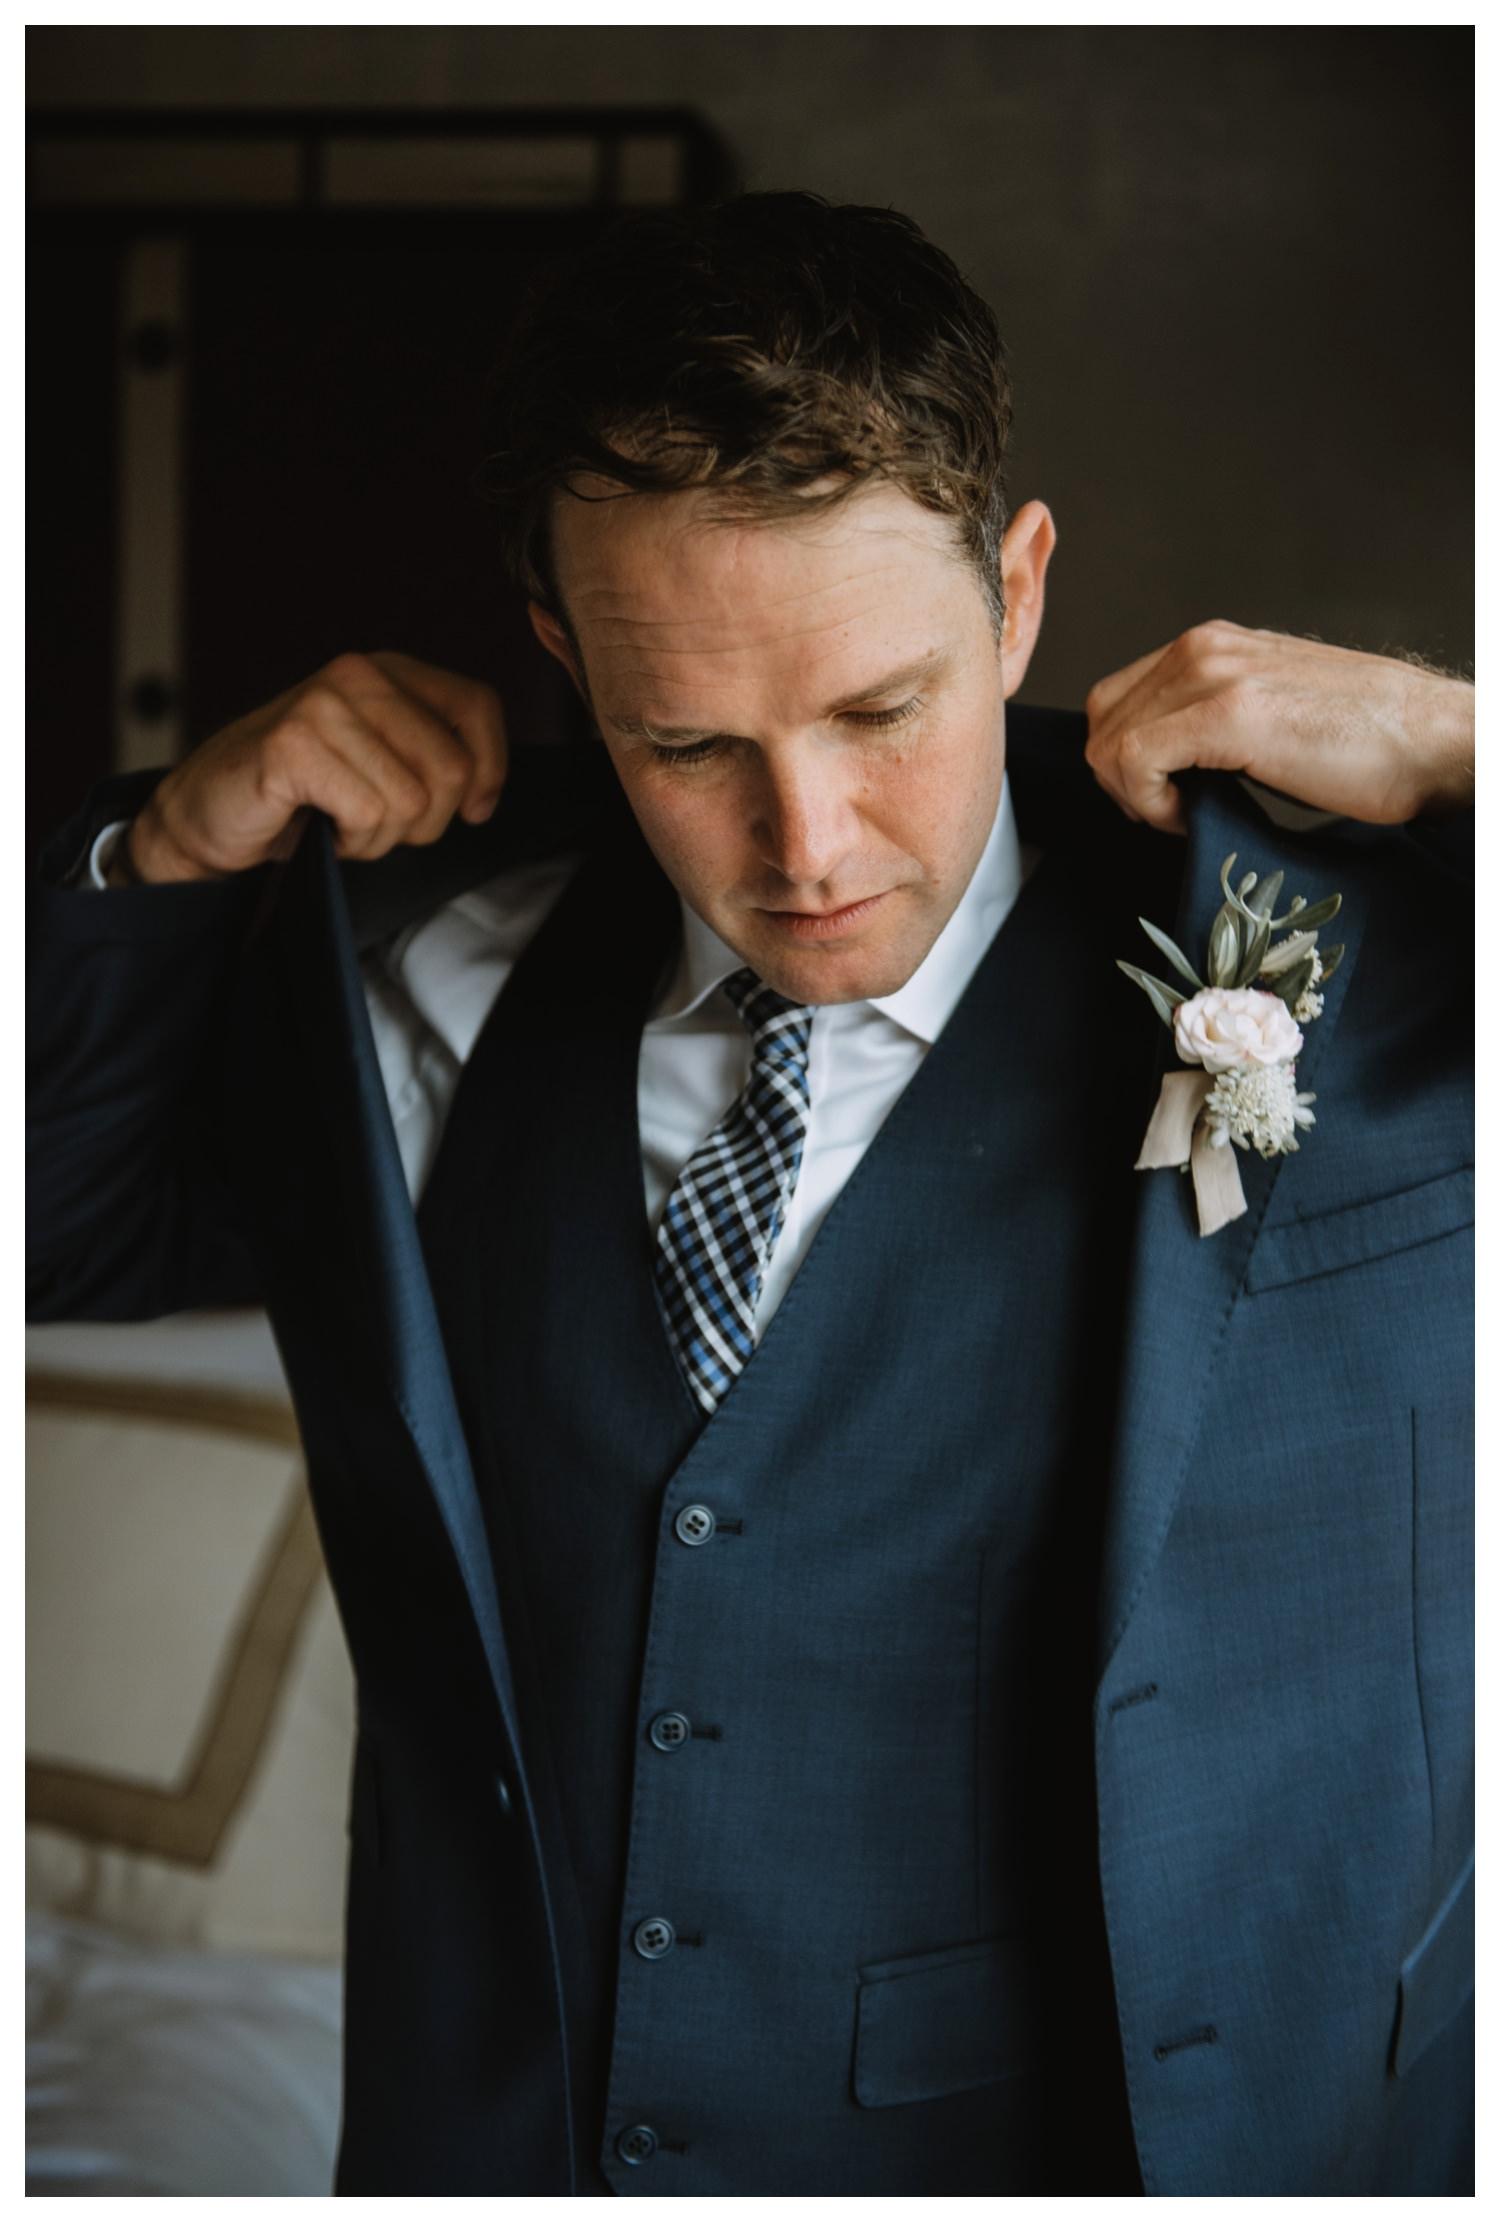 A groom adjusts his jacket on his wedding day